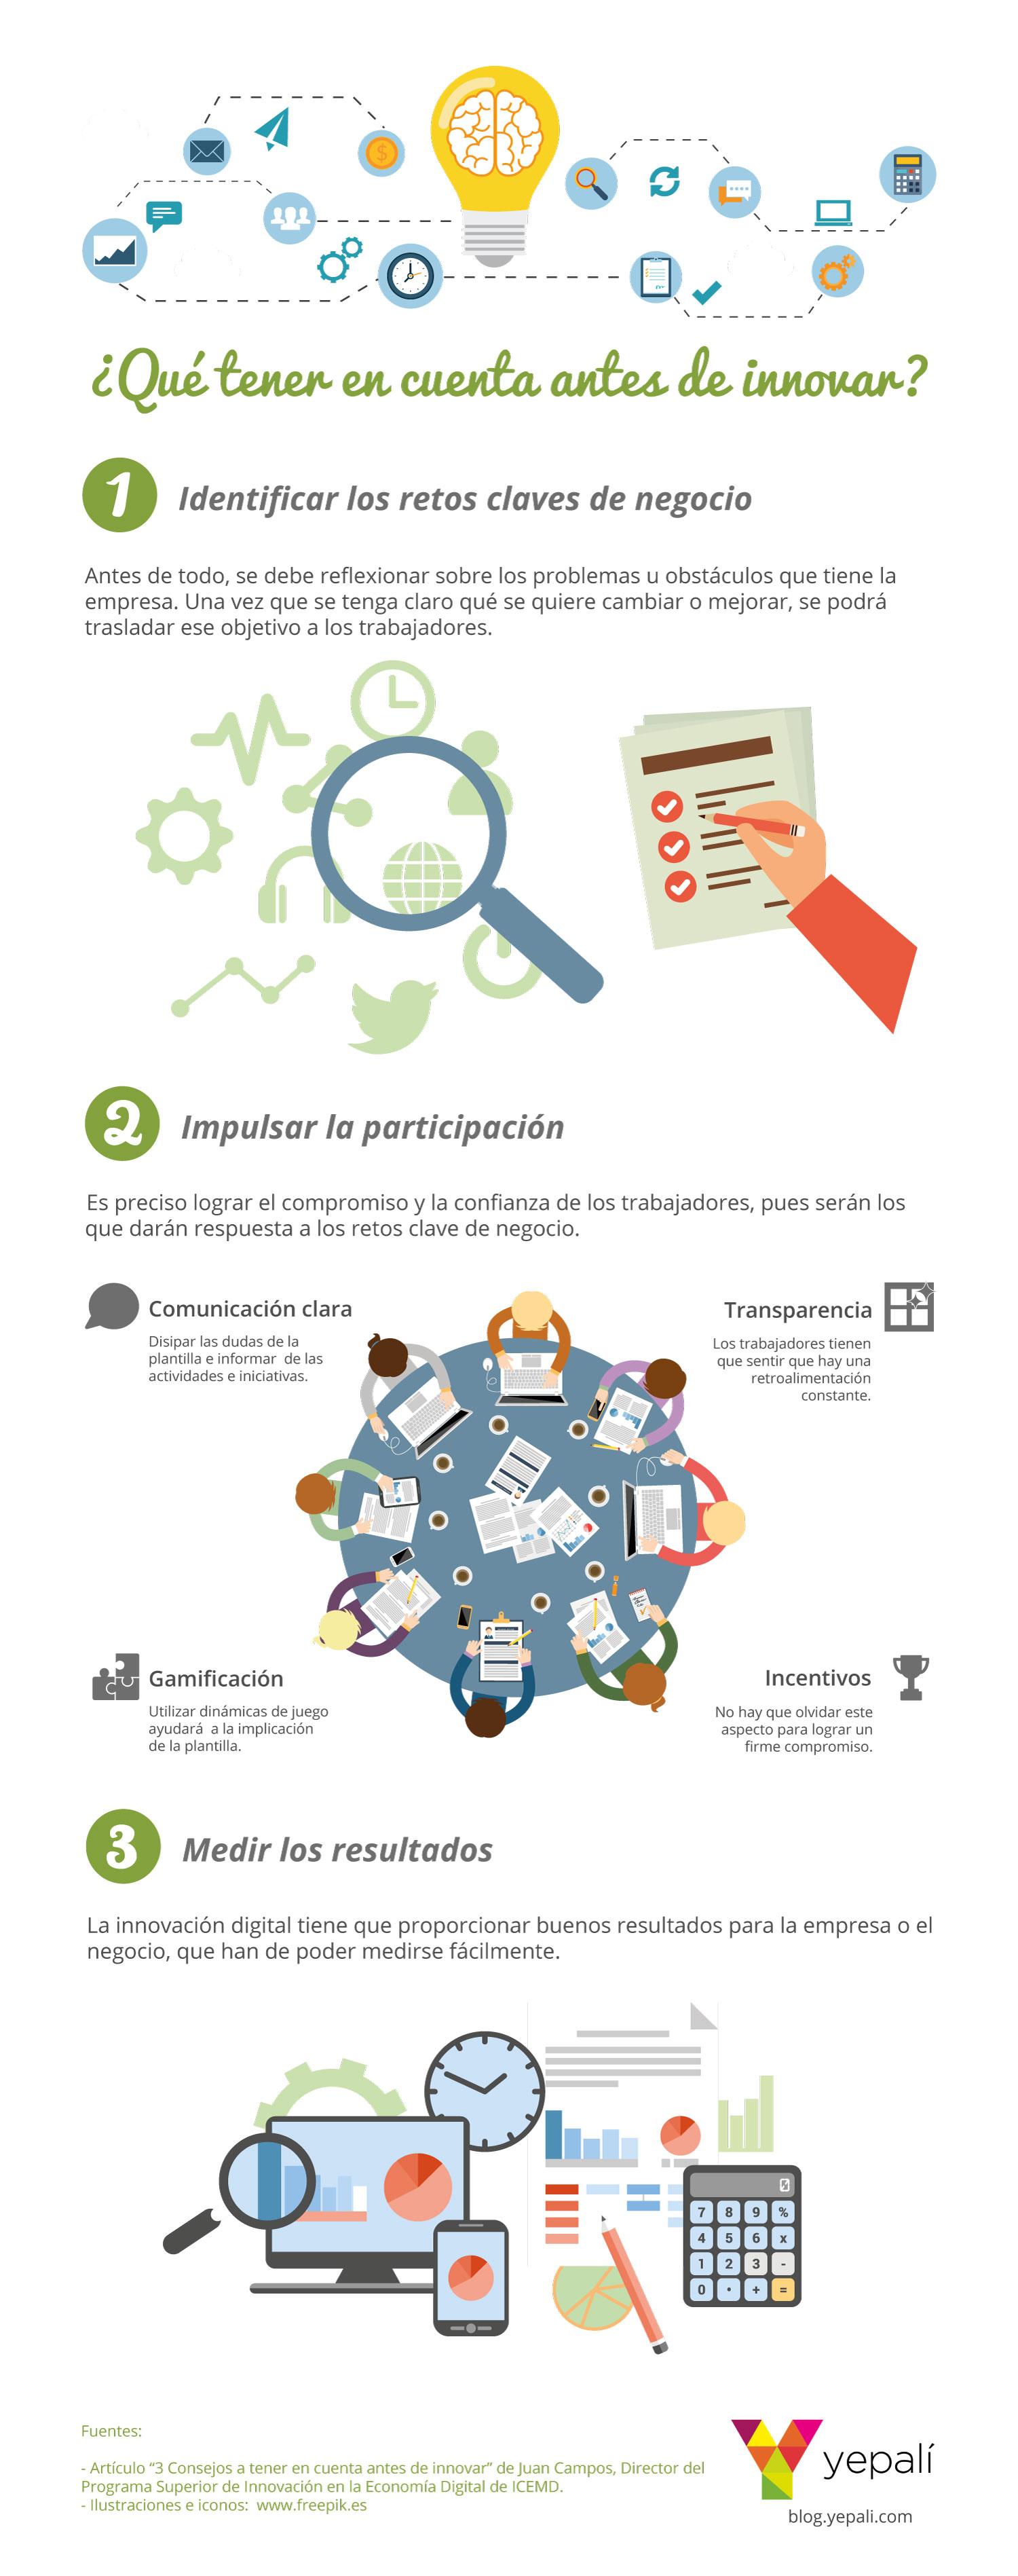 Qué tener en cuenta antes de Innovar #infografia #infographic #innovation